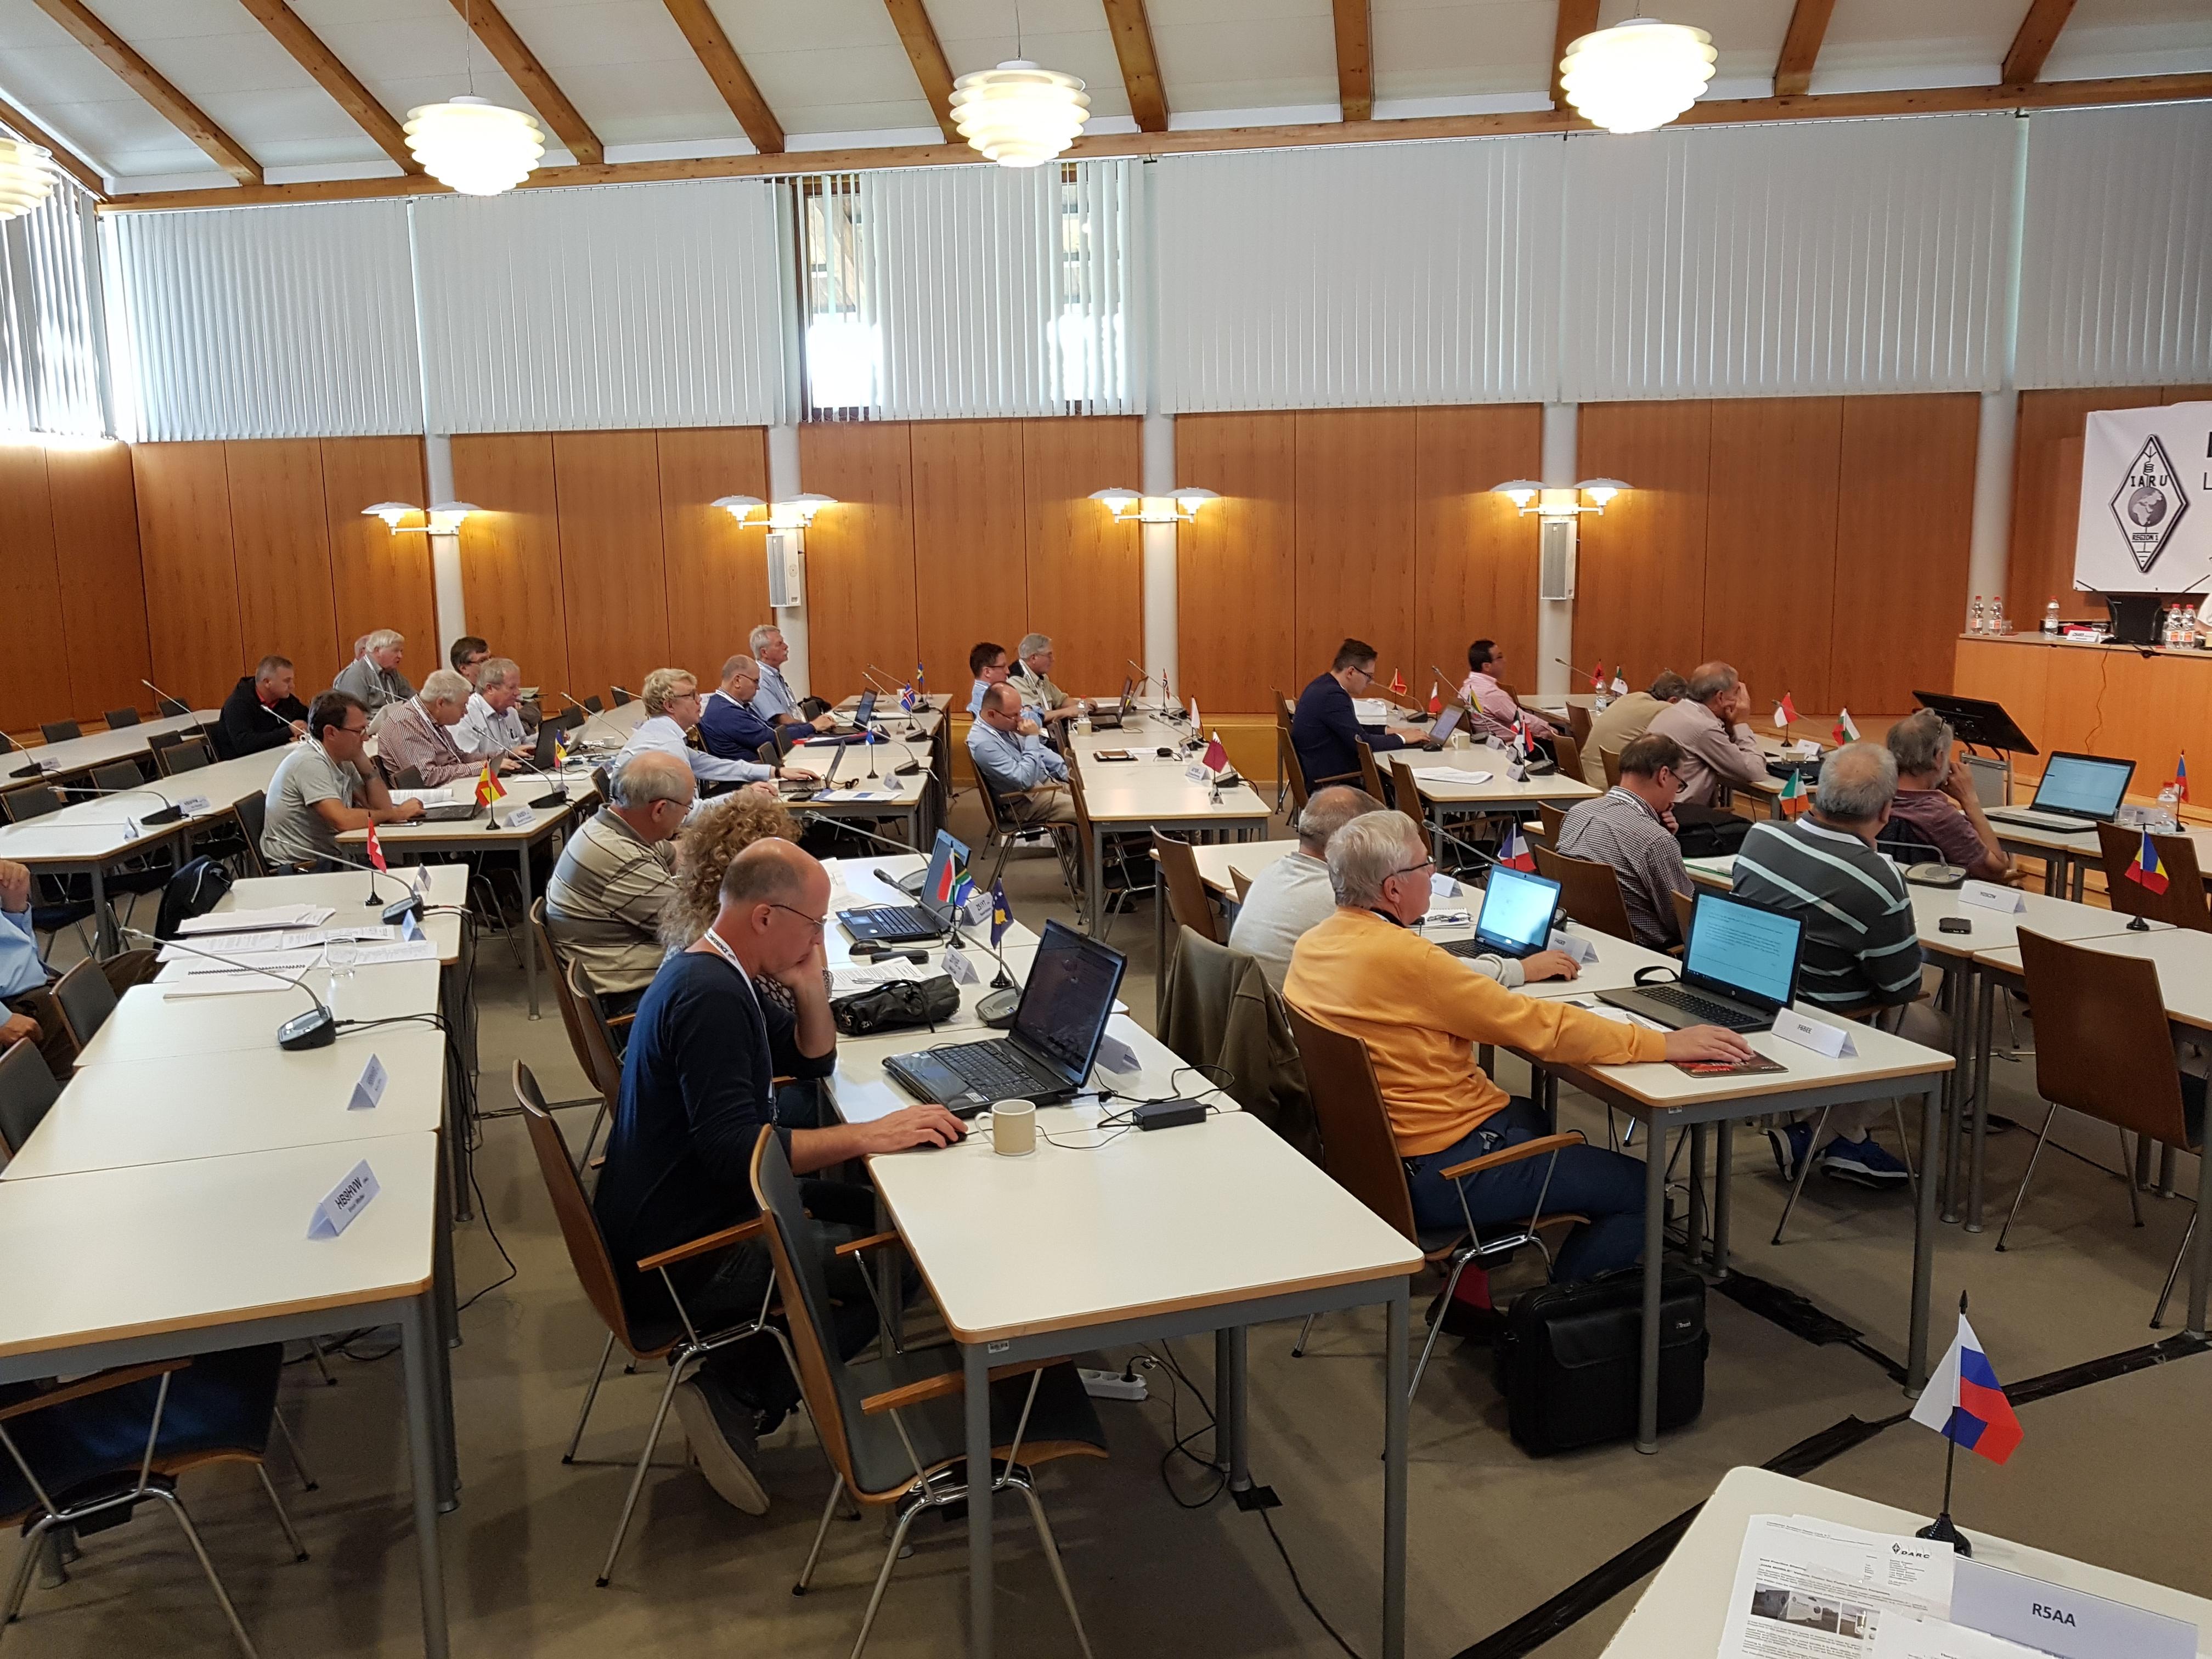 IARU-R1 Landshut: verslag van maandag